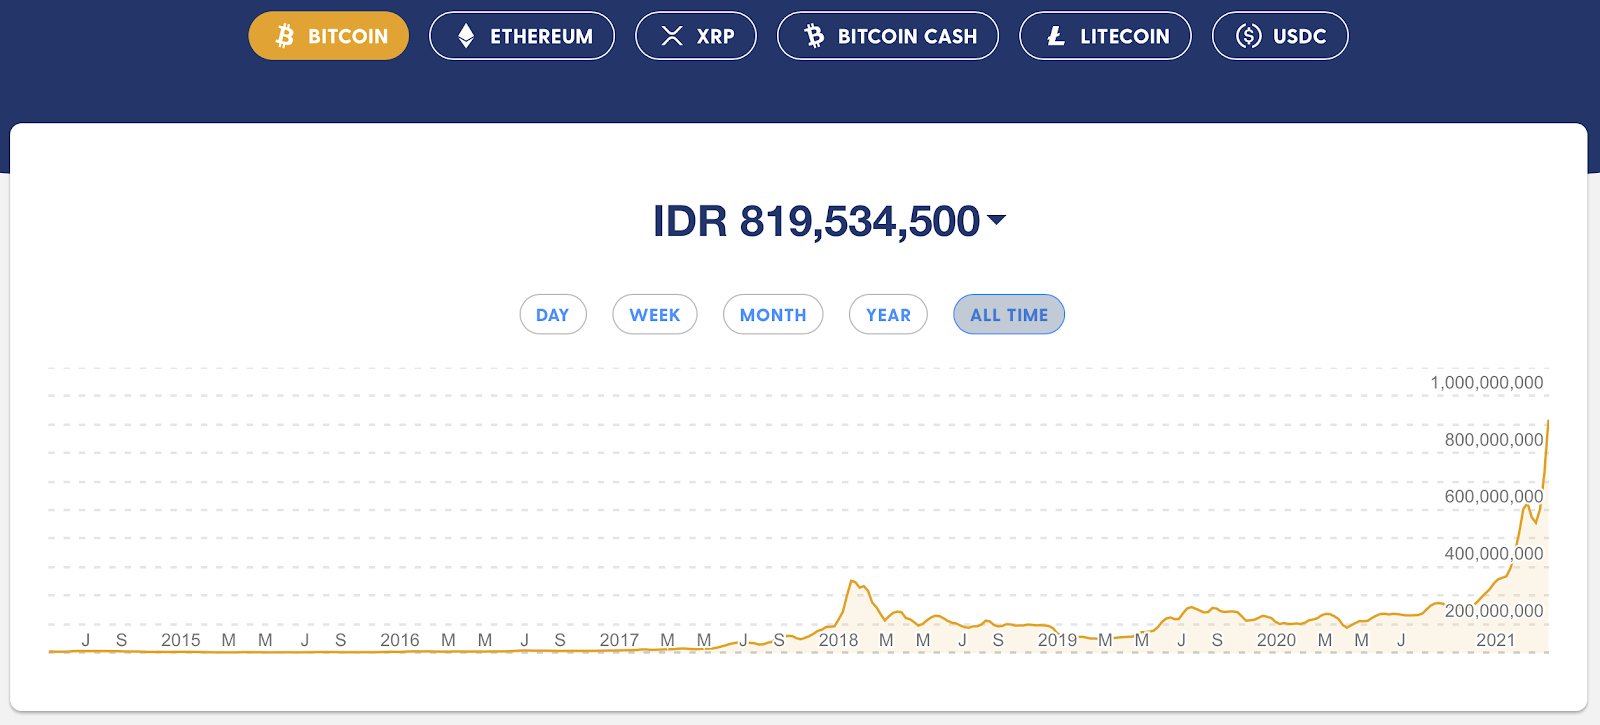 Perkembangan Harga Bitcoin sejak awal (Rp)